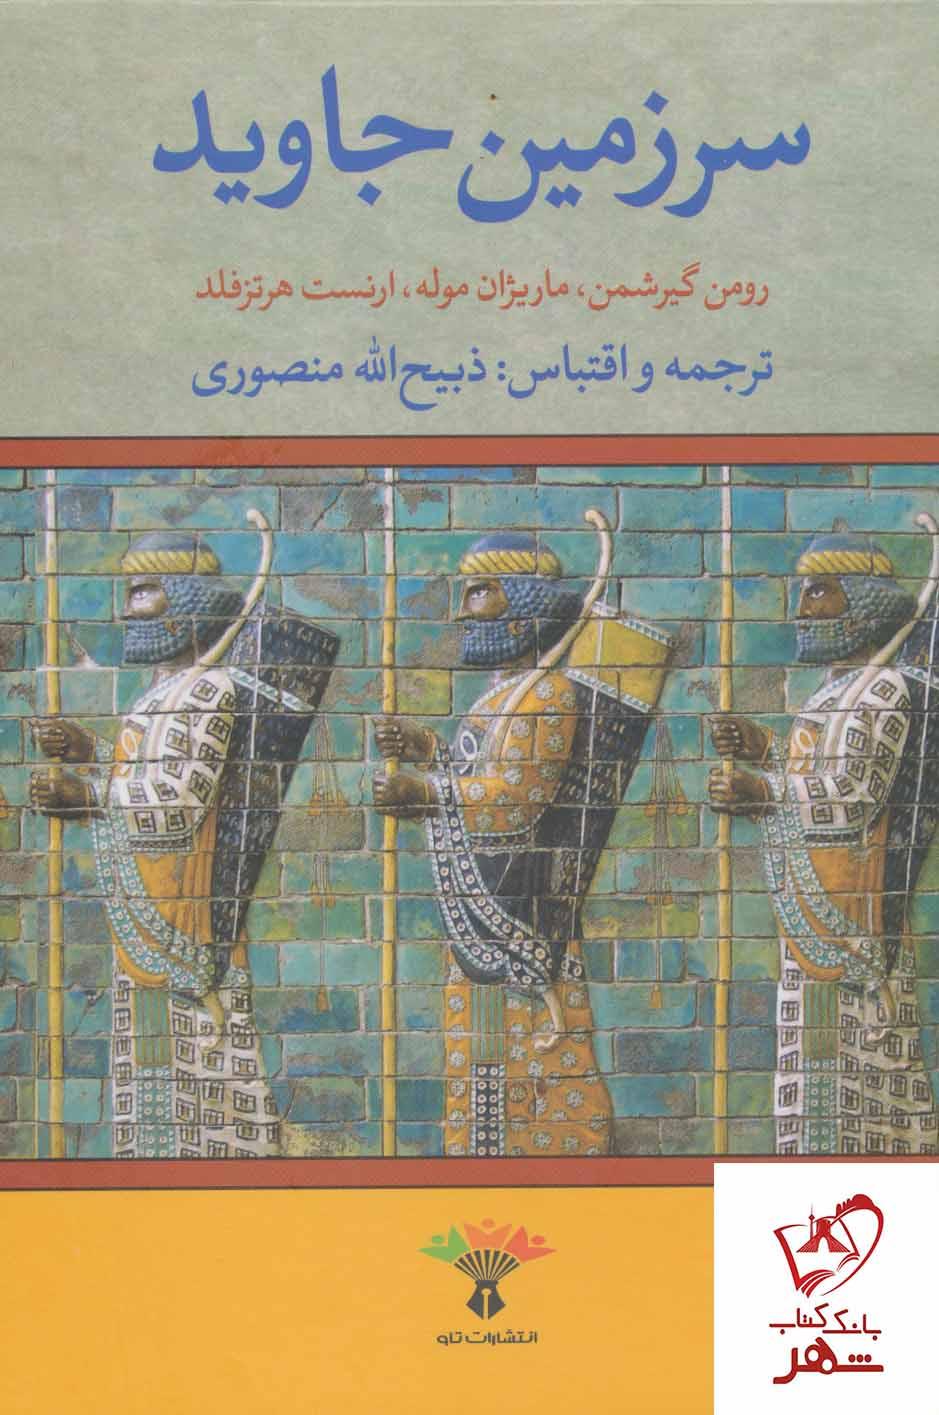 خرید کتاب سرزمین جاوید (چهار جلدی) نوشته رومن گیرشمن نشر تاو